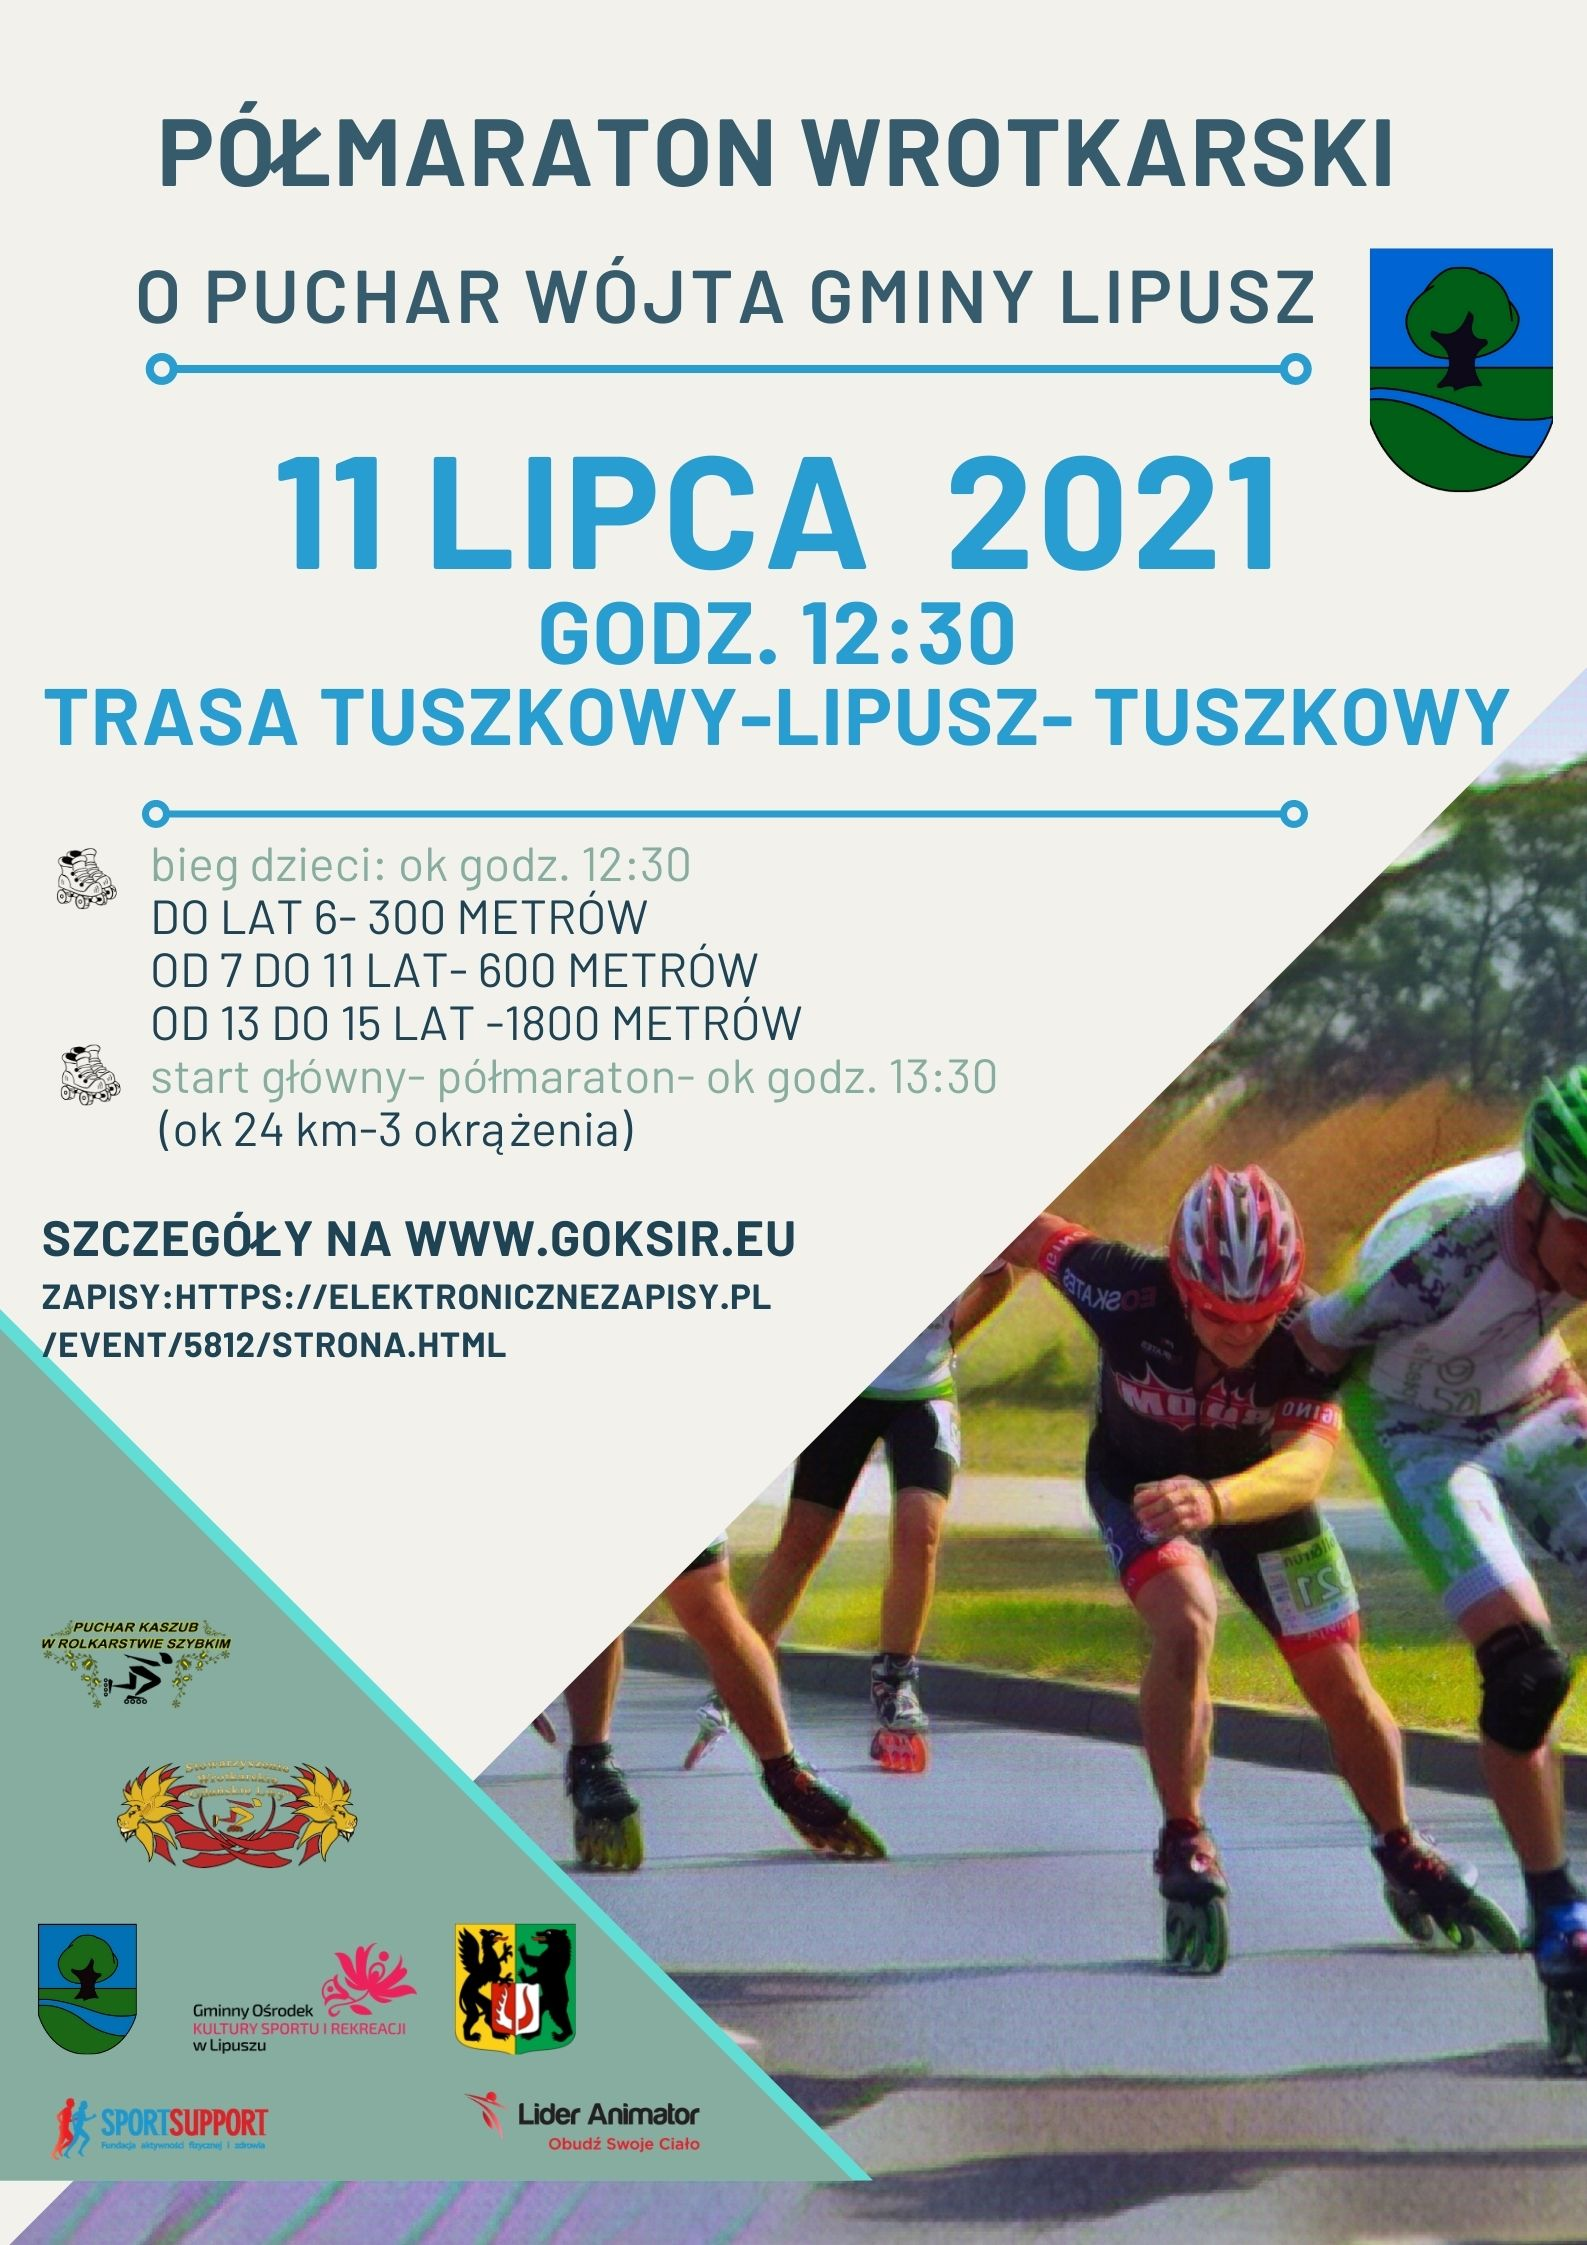 Półmaraton Wrotkarski o puchar wójta gminy Lipusz